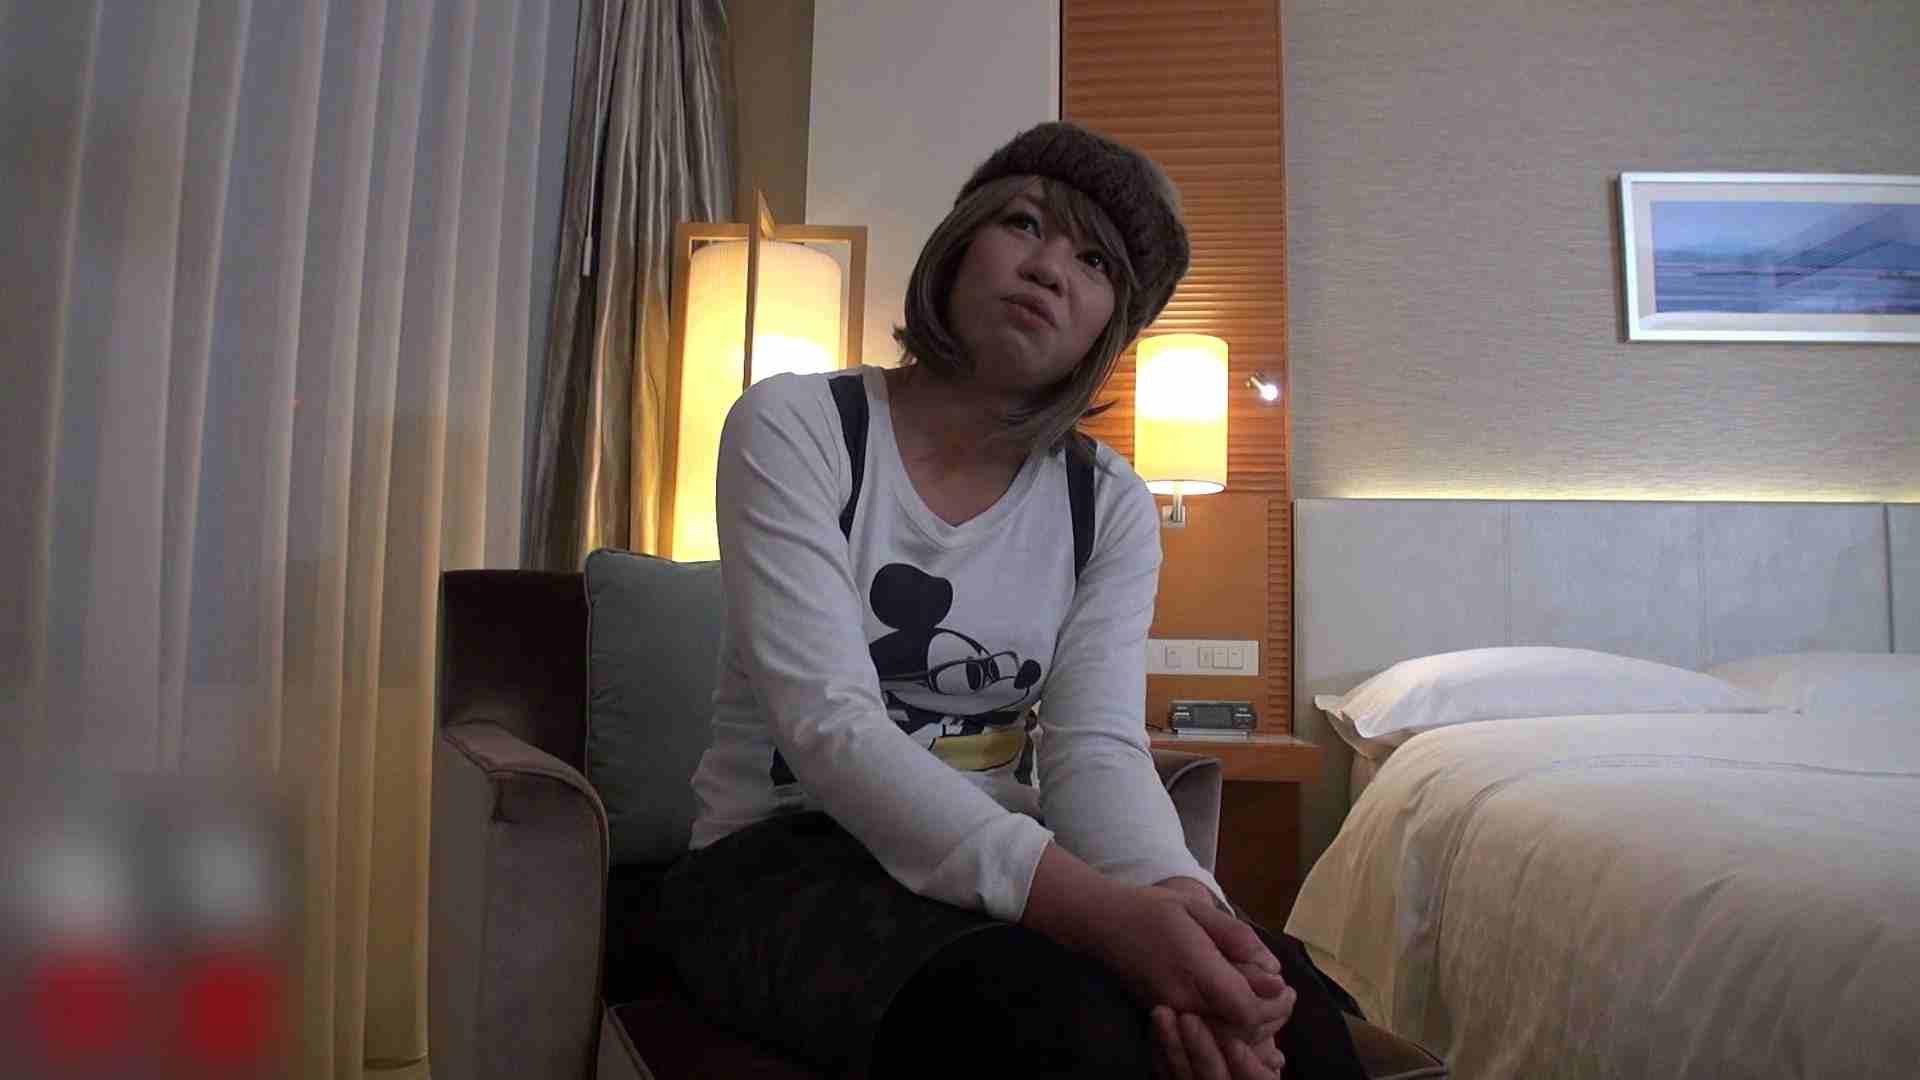 S級厳選美女ビッチガールVol.42 前編 すけべな美女 ワレメ動画紹介 83画像 44